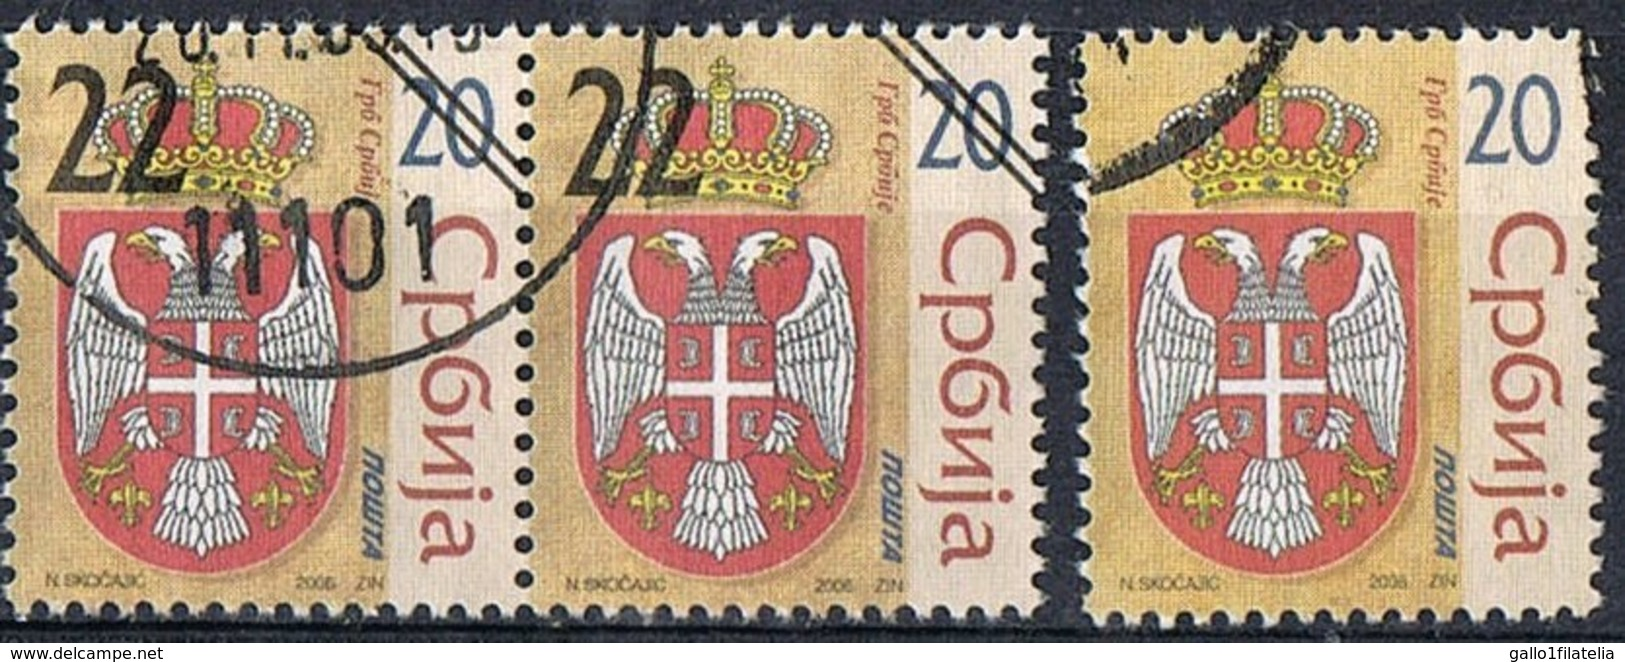 2006/2009 - SERBIA - STEMMA / COAT OF ARMS. USATO - Serbia